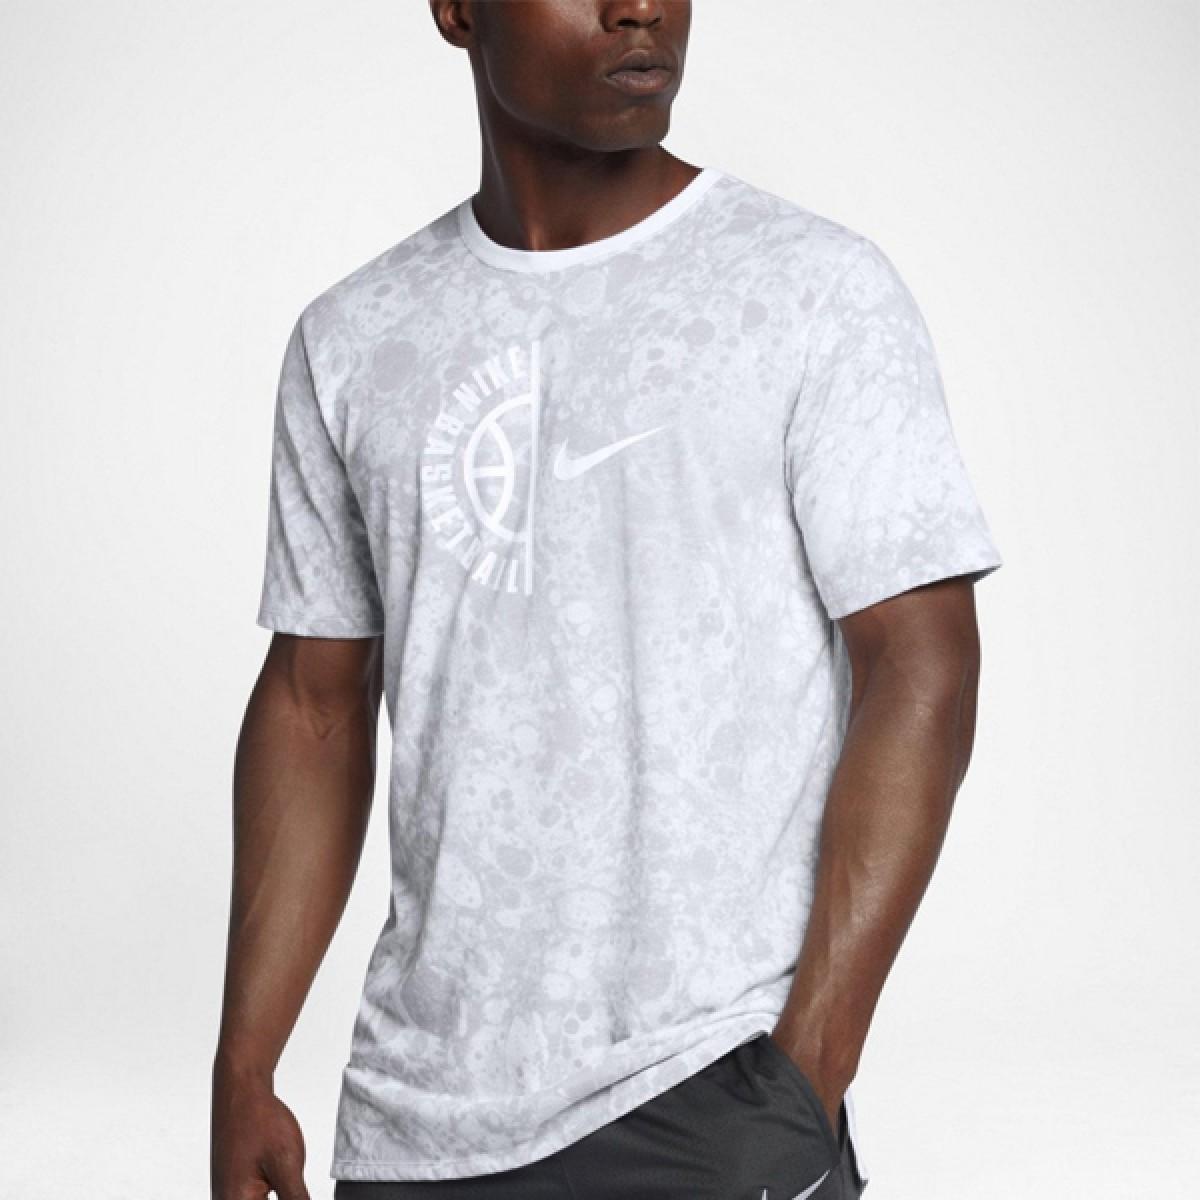 Nike Dry Basketball T-Shirt 'Grey' 857930-100